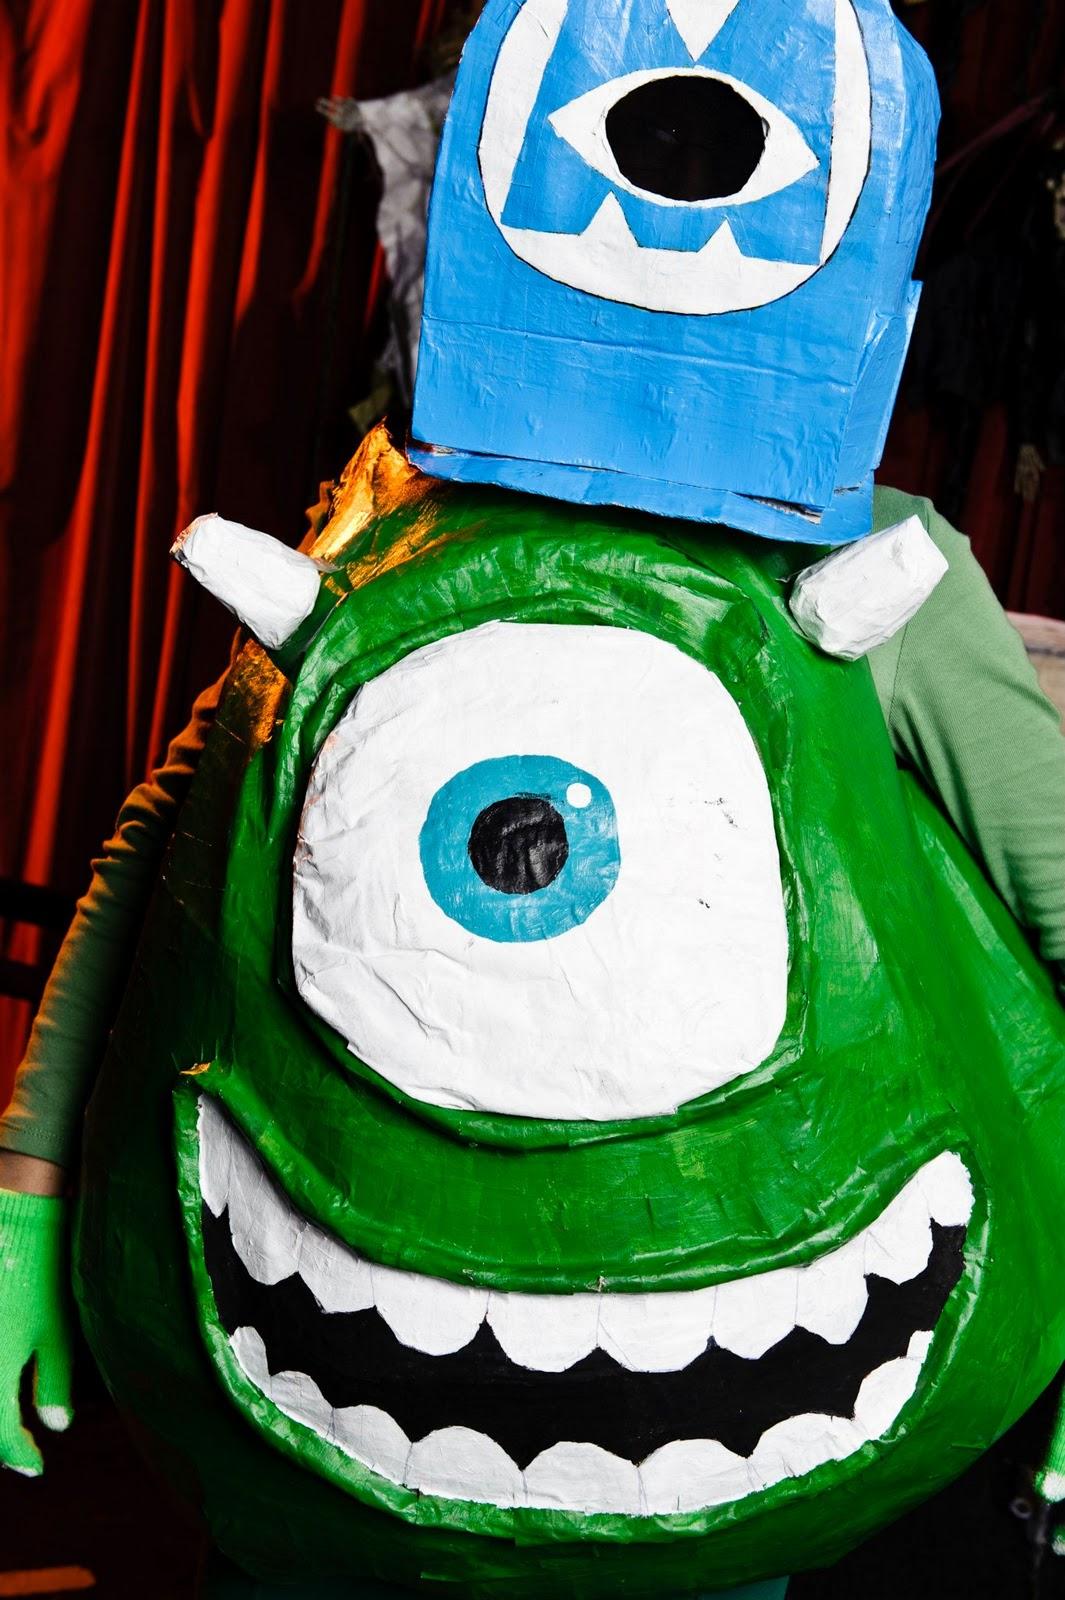 Pop Culture Costumes Fully Built Mike Wazowski